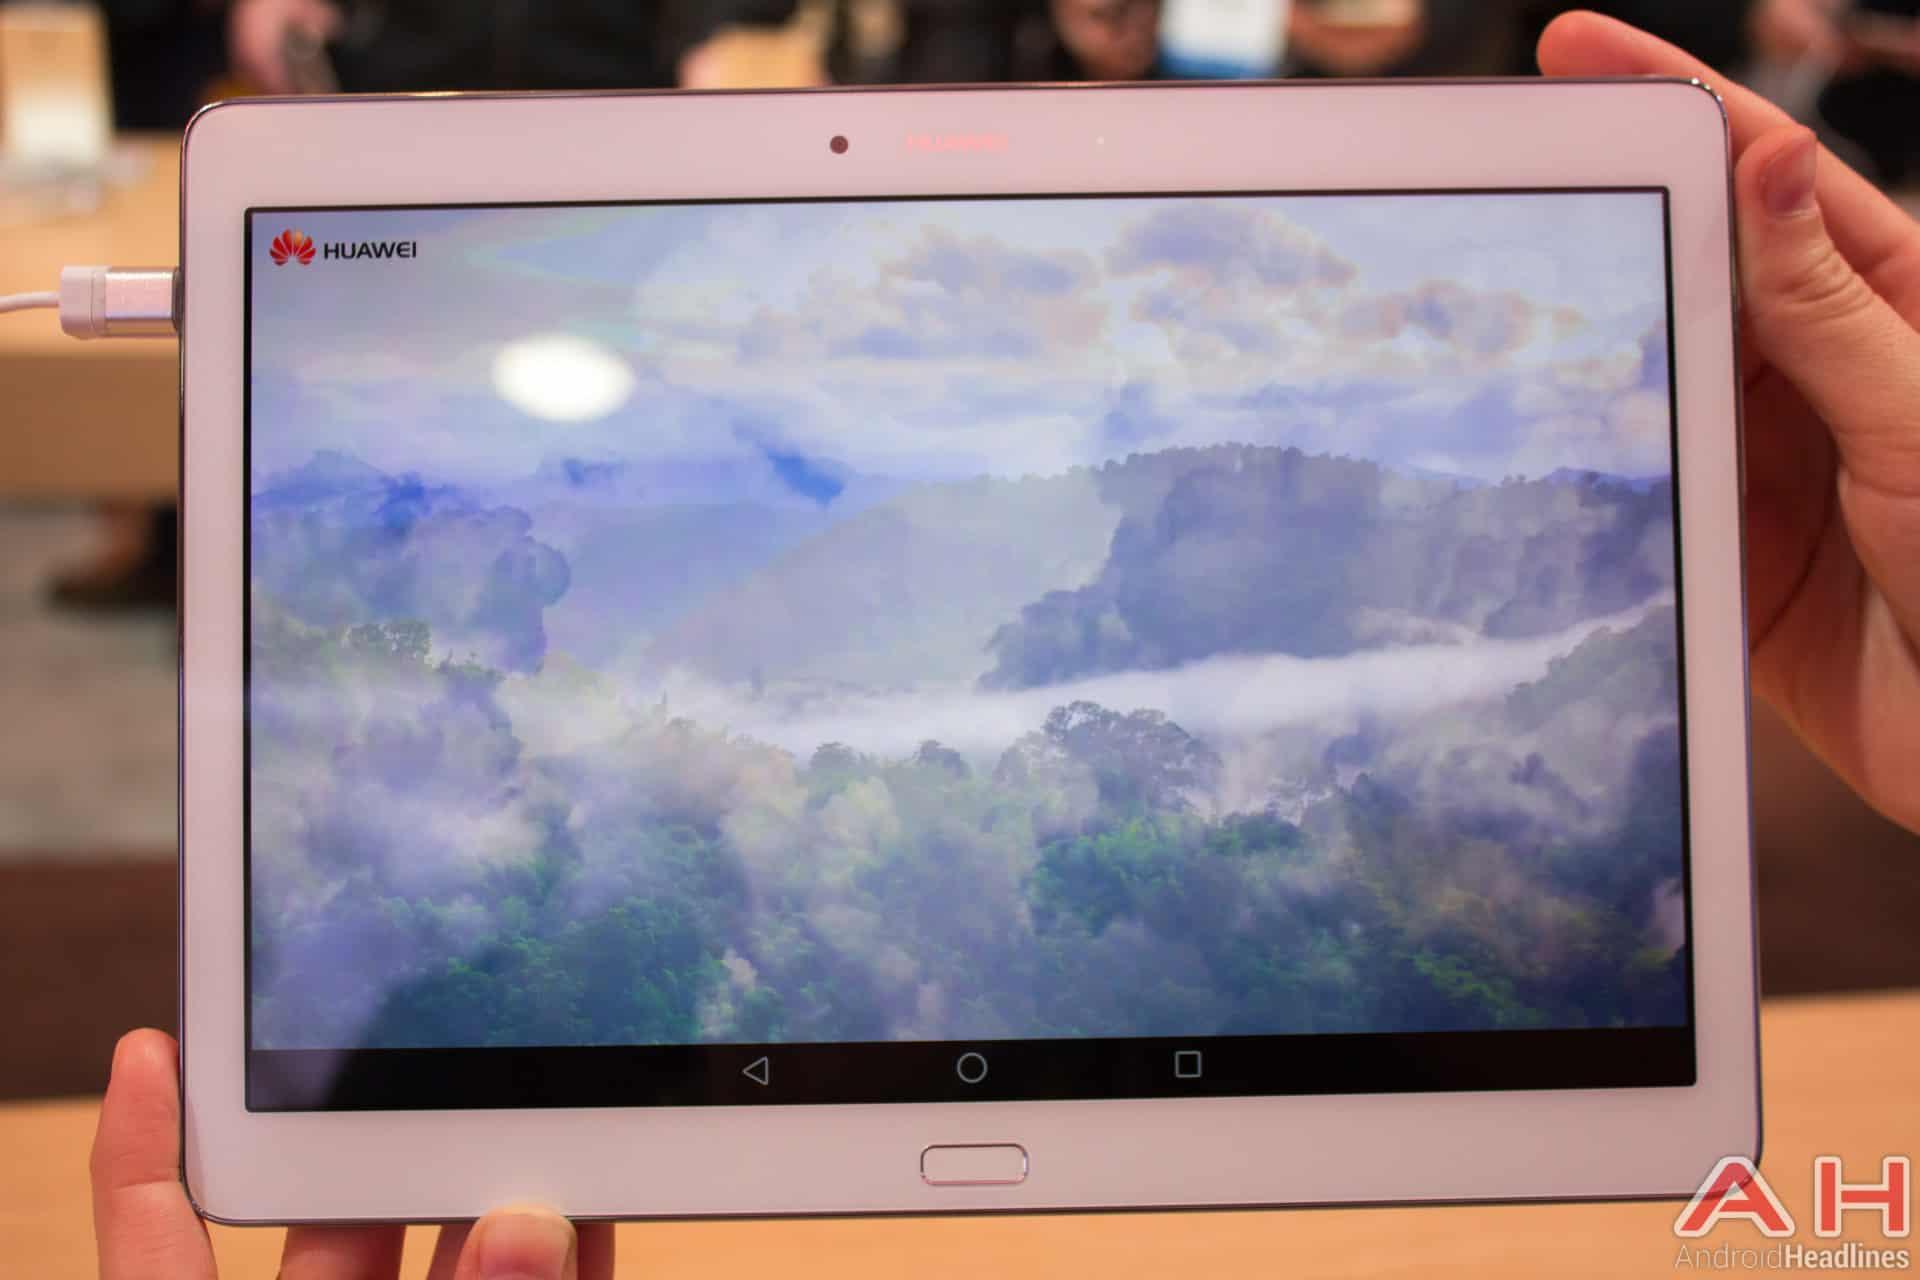 Huawei MediaPad M2 10 7